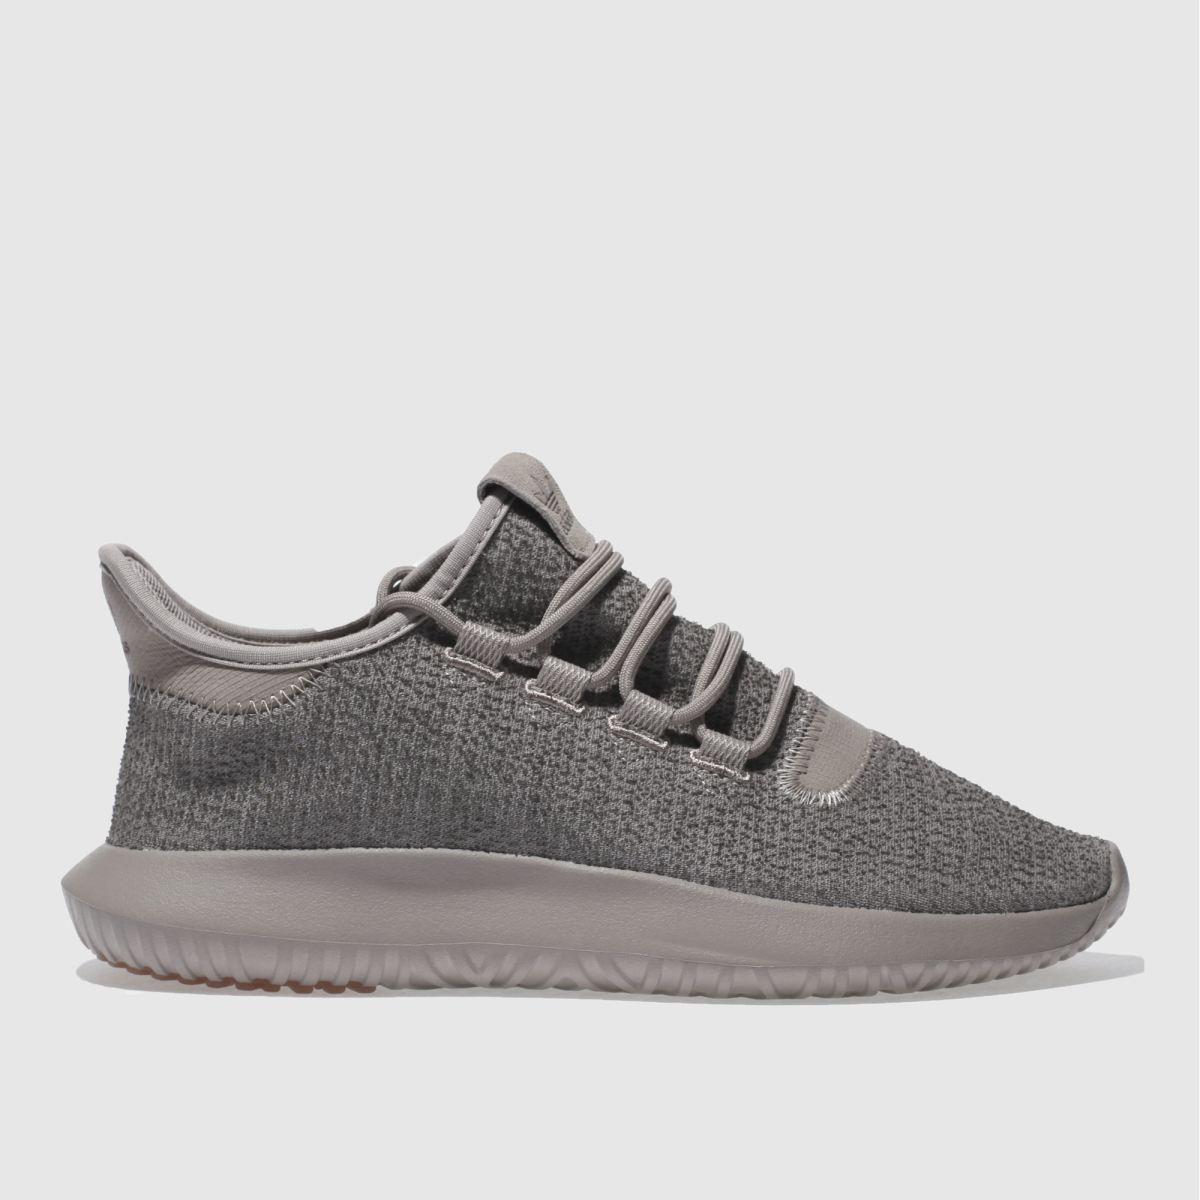 adidas light taupe tubular shadow trainers